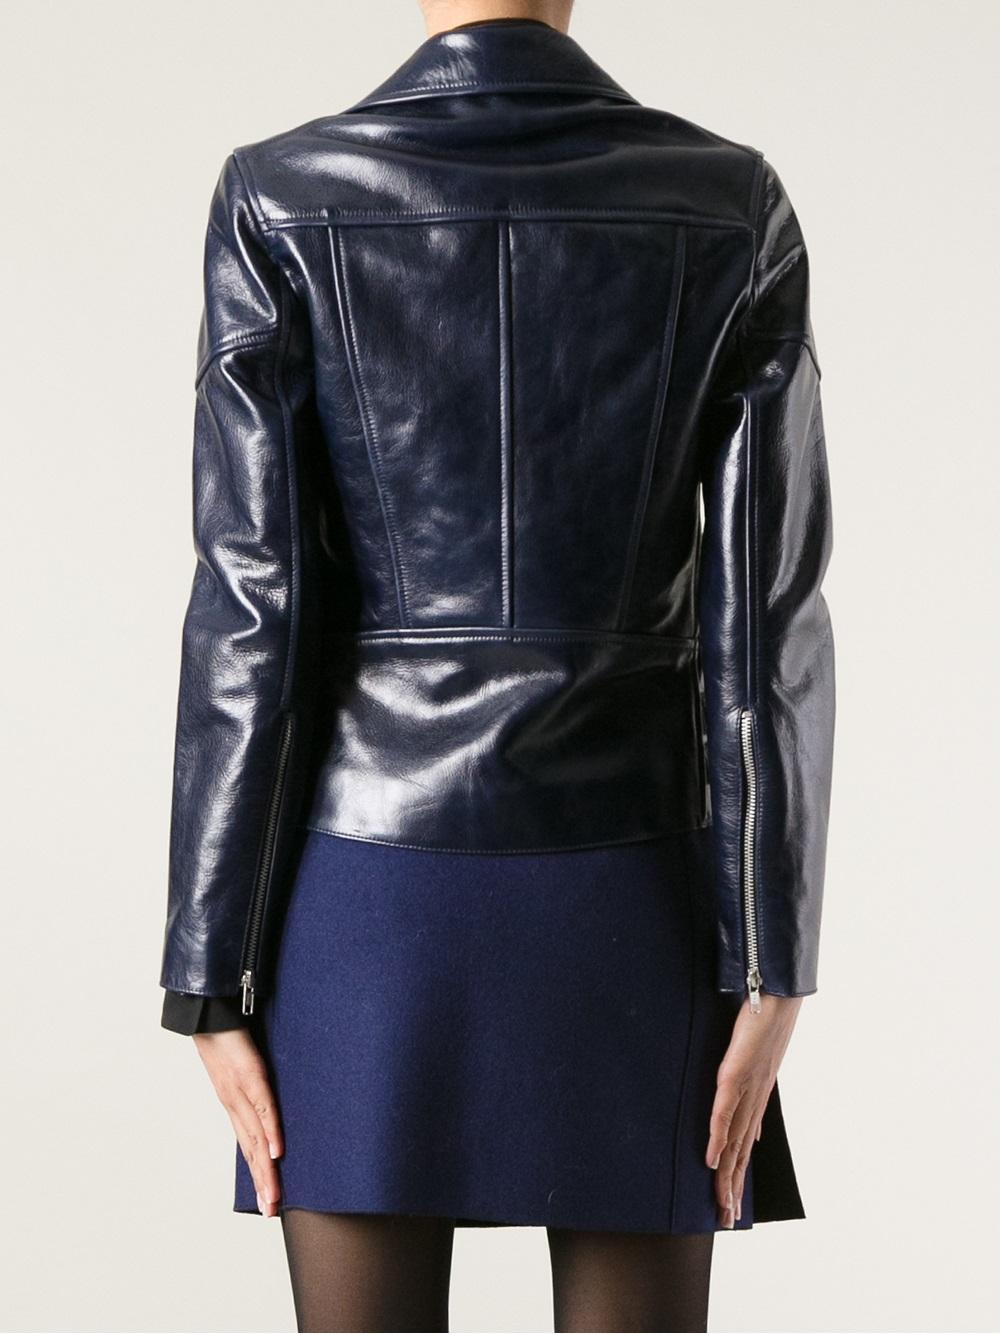 Victoria beckham leather jacket